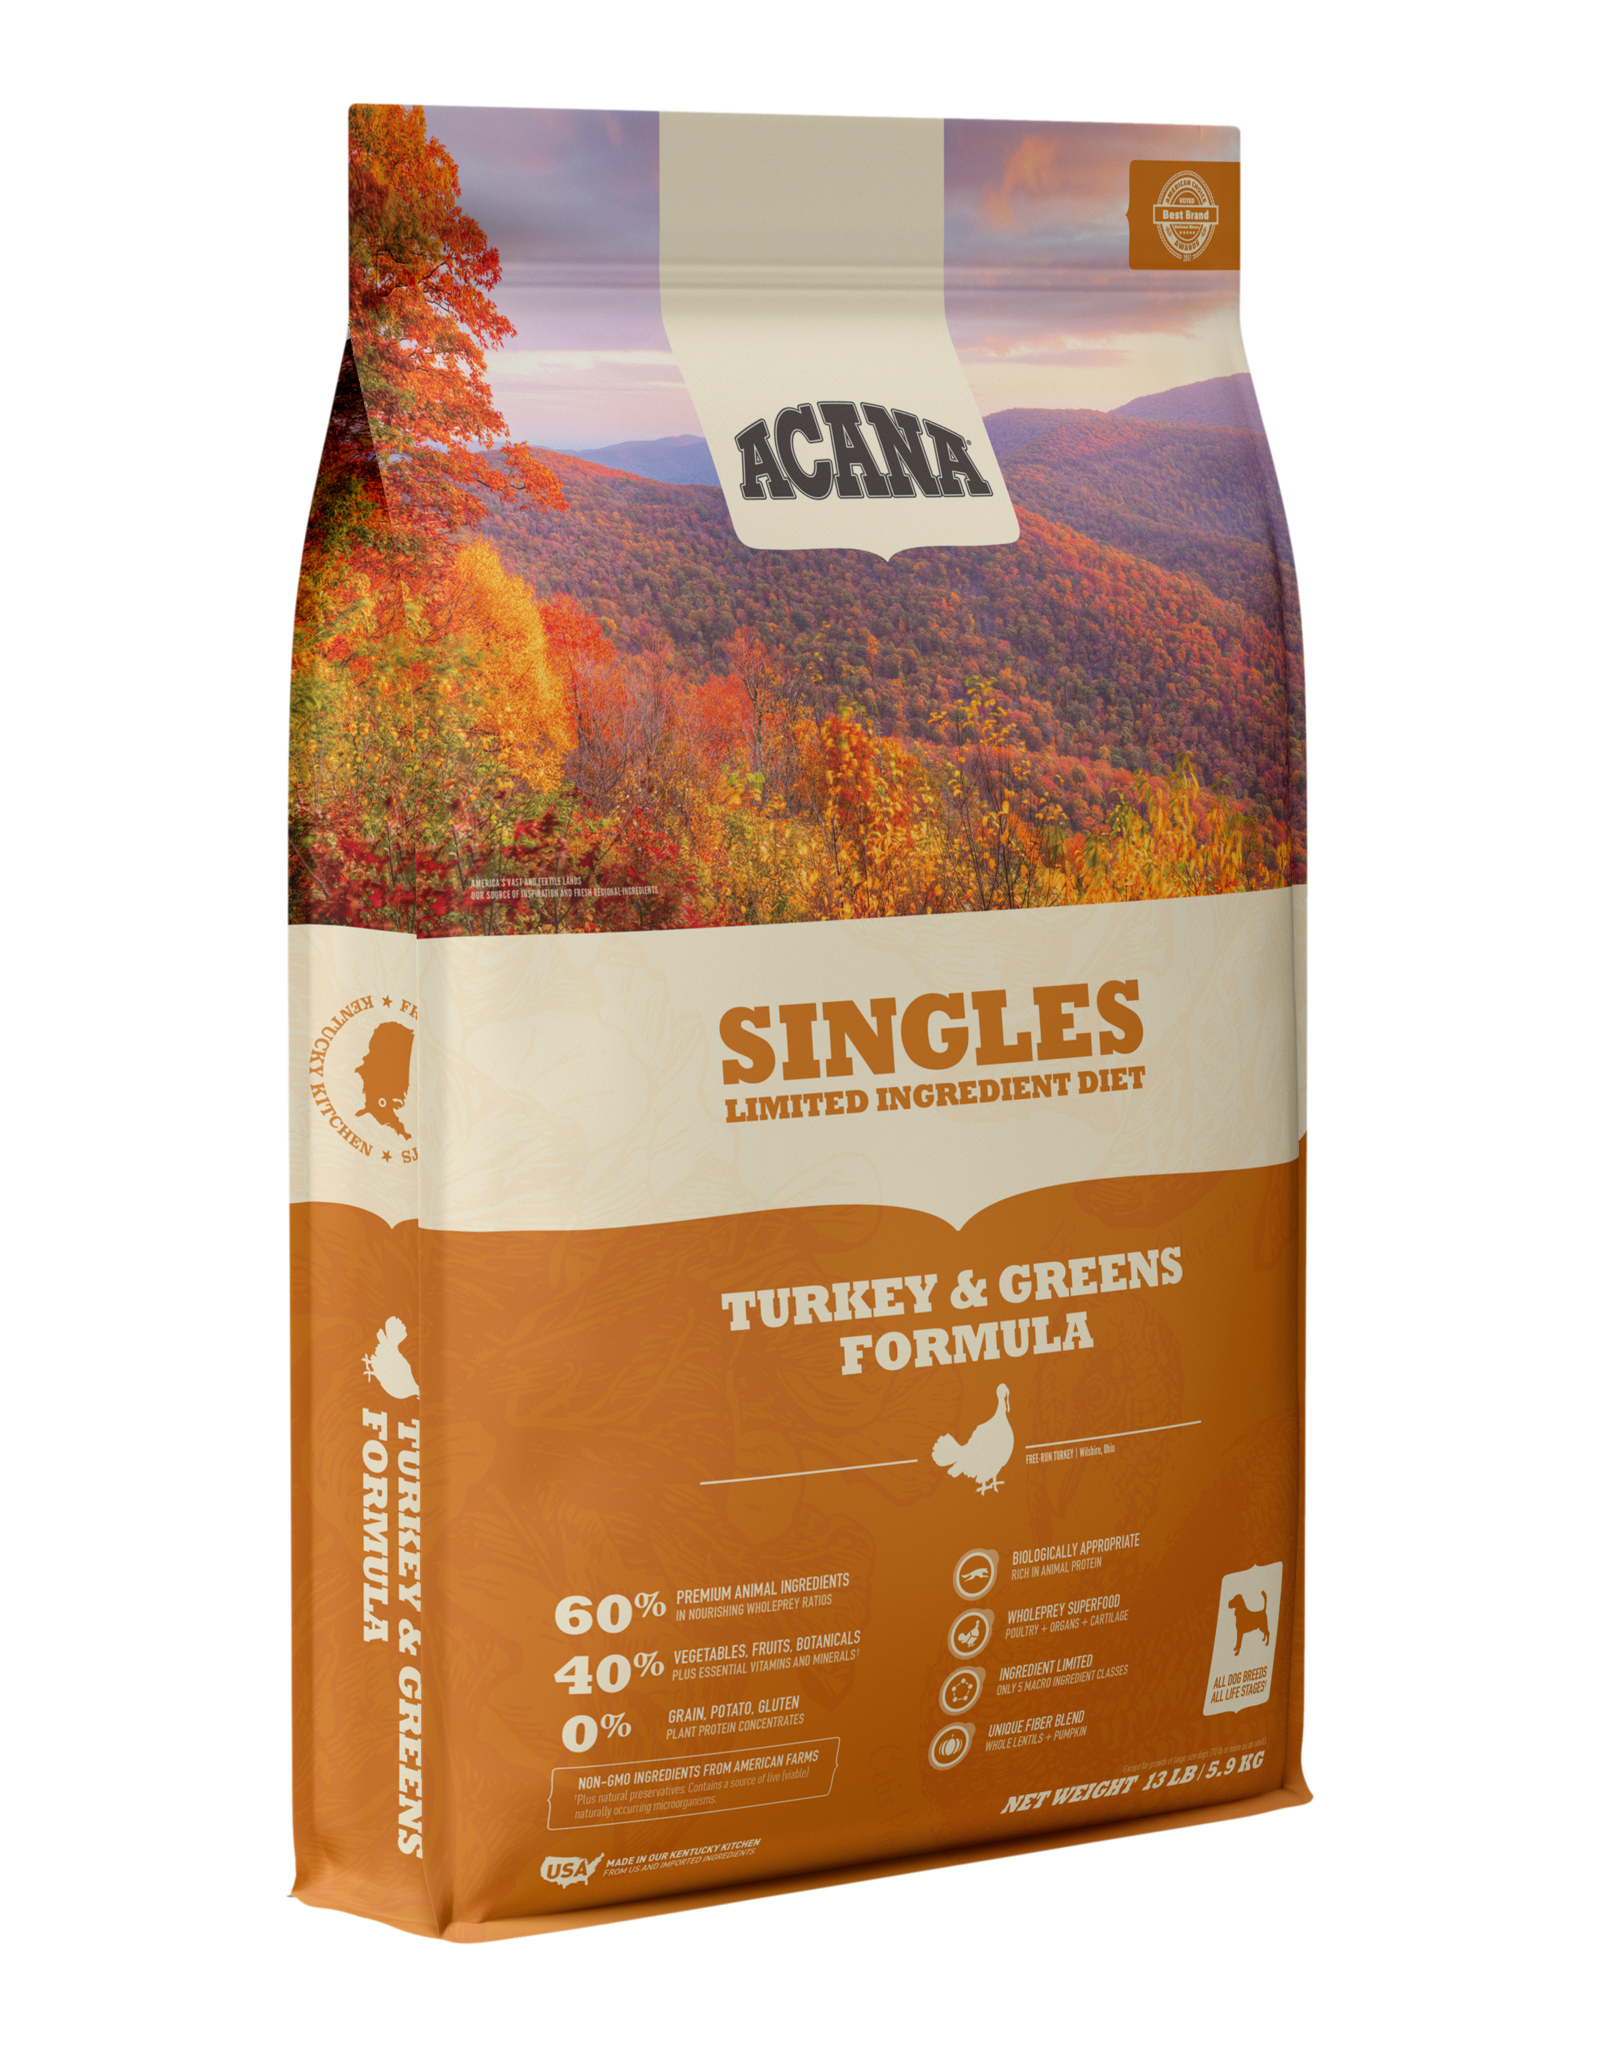 Acana Acana Dry Dog Food Singles Turkey & Greens Formula Limited Ingredient Diet Grain Free